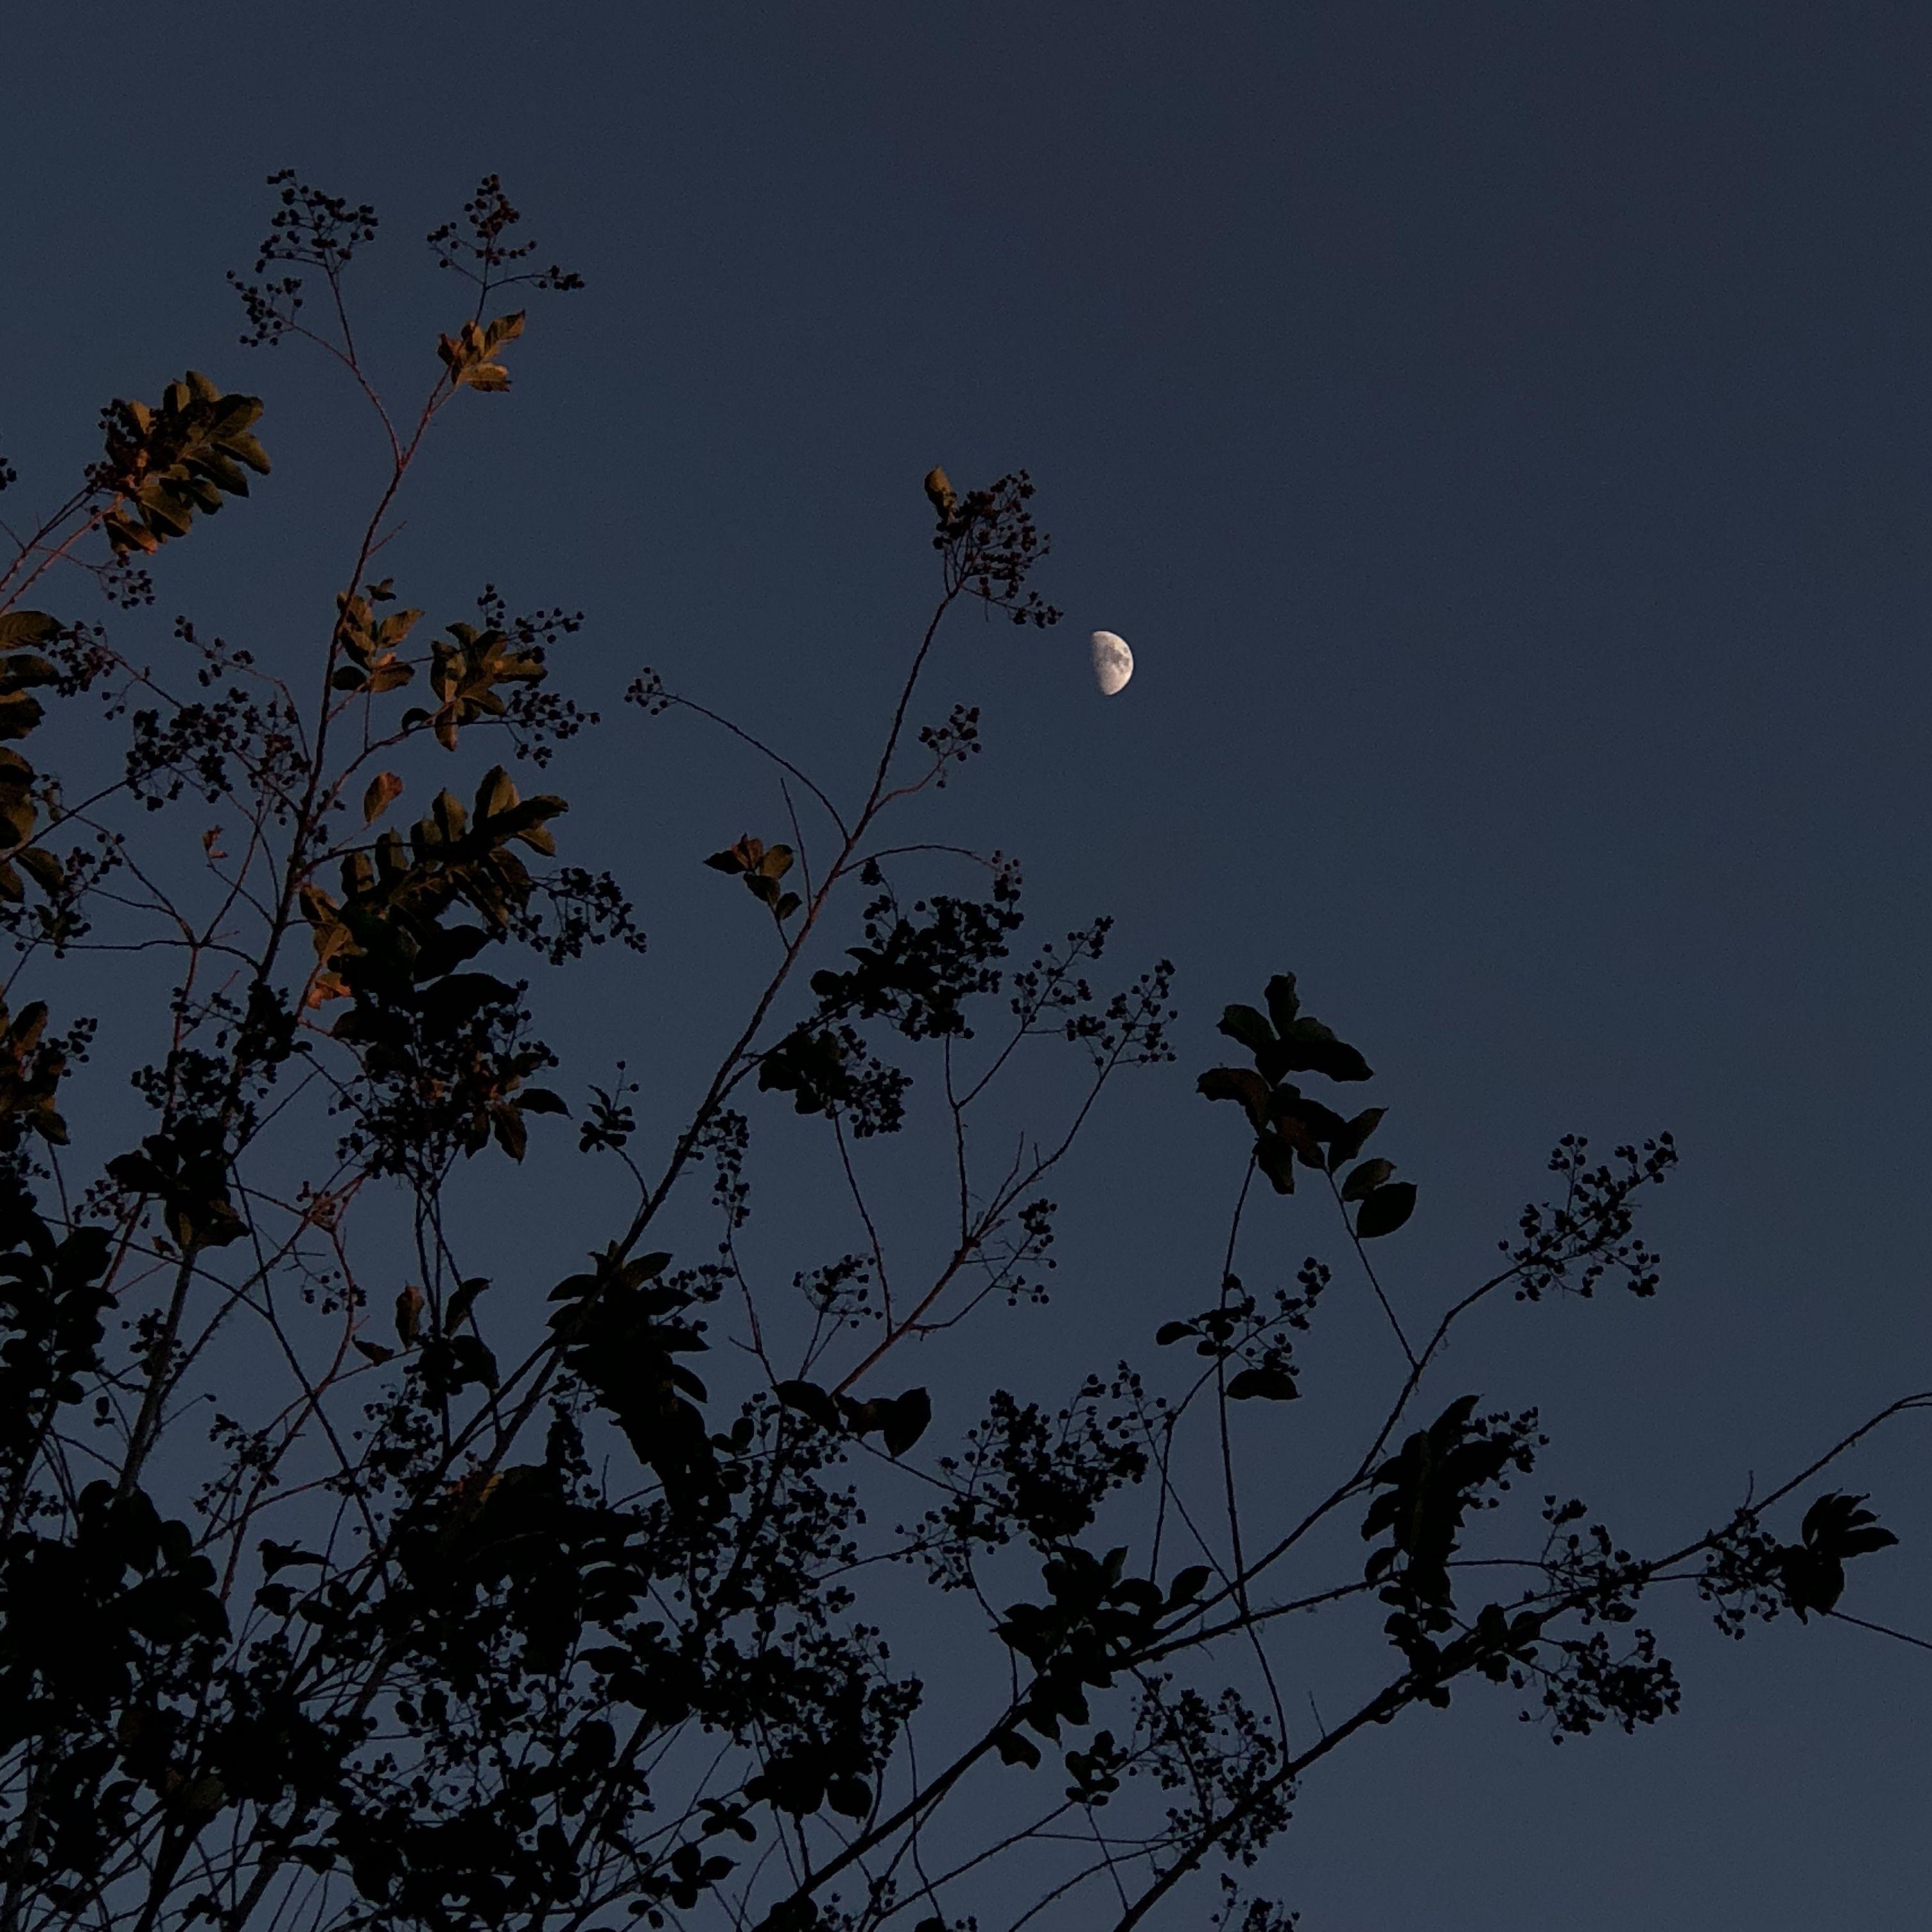 La Lune Sky Aesthetic Nature Aesthetic Night Aesthetic